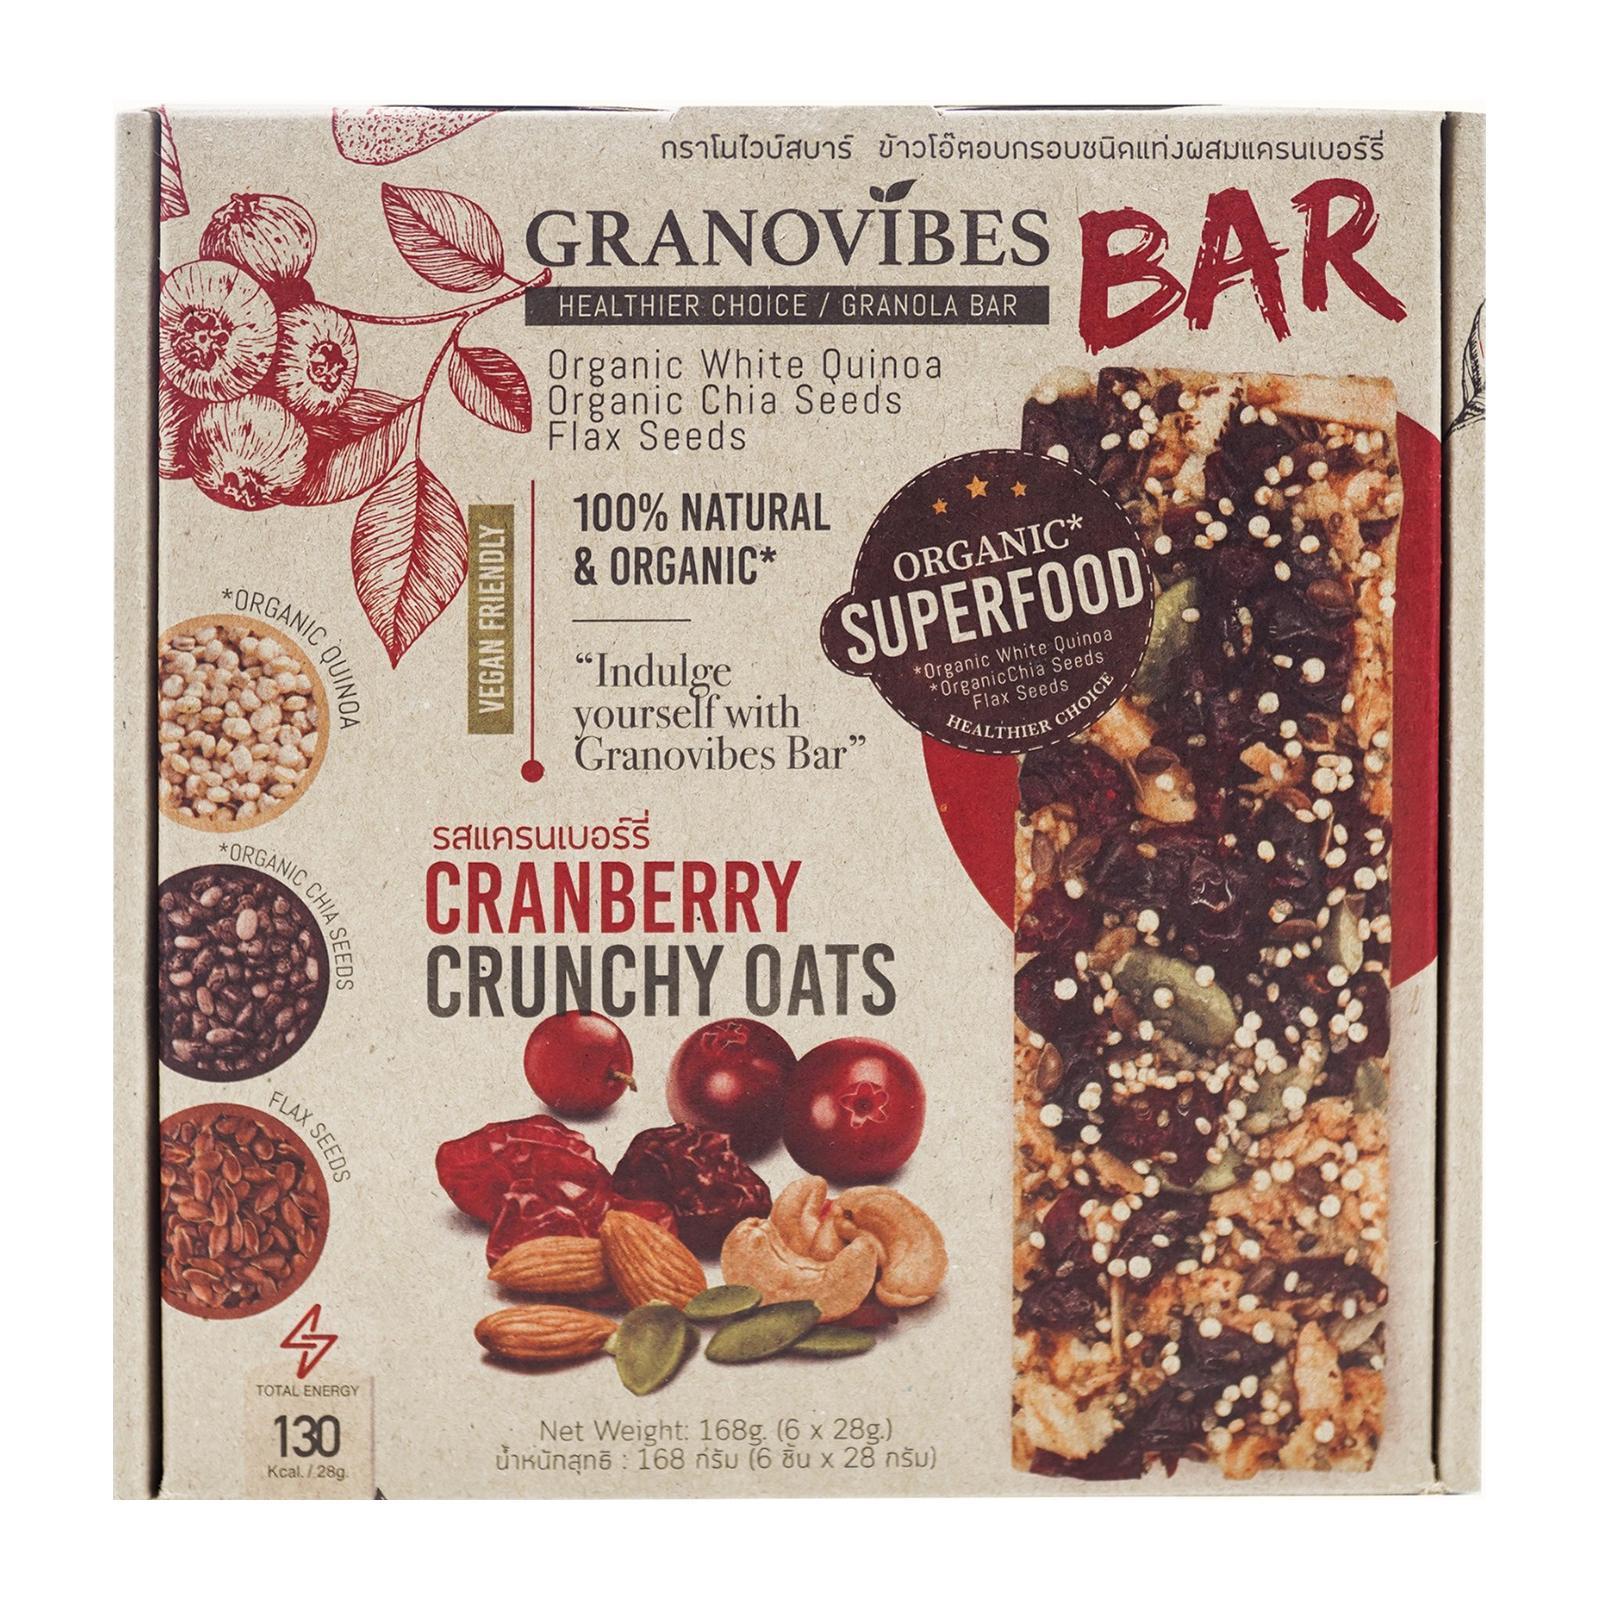 Granovibes Cranberry Crunchy Oats Granola